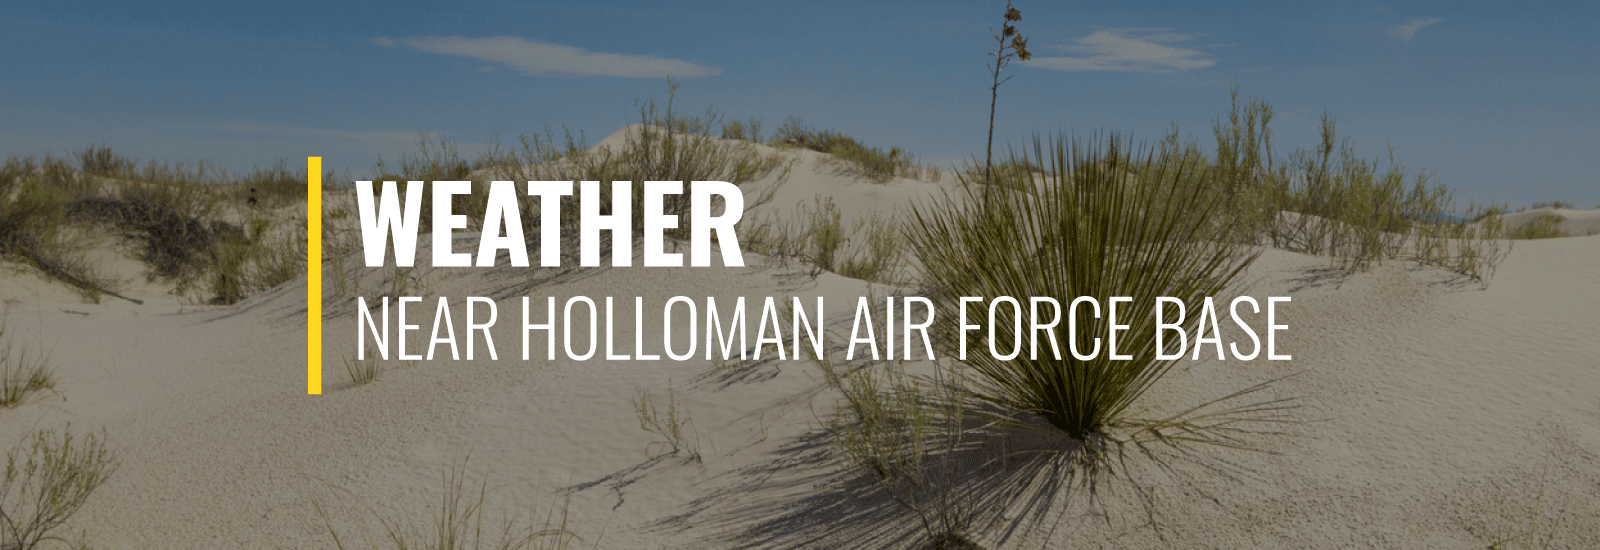 Holloman AFB Weather